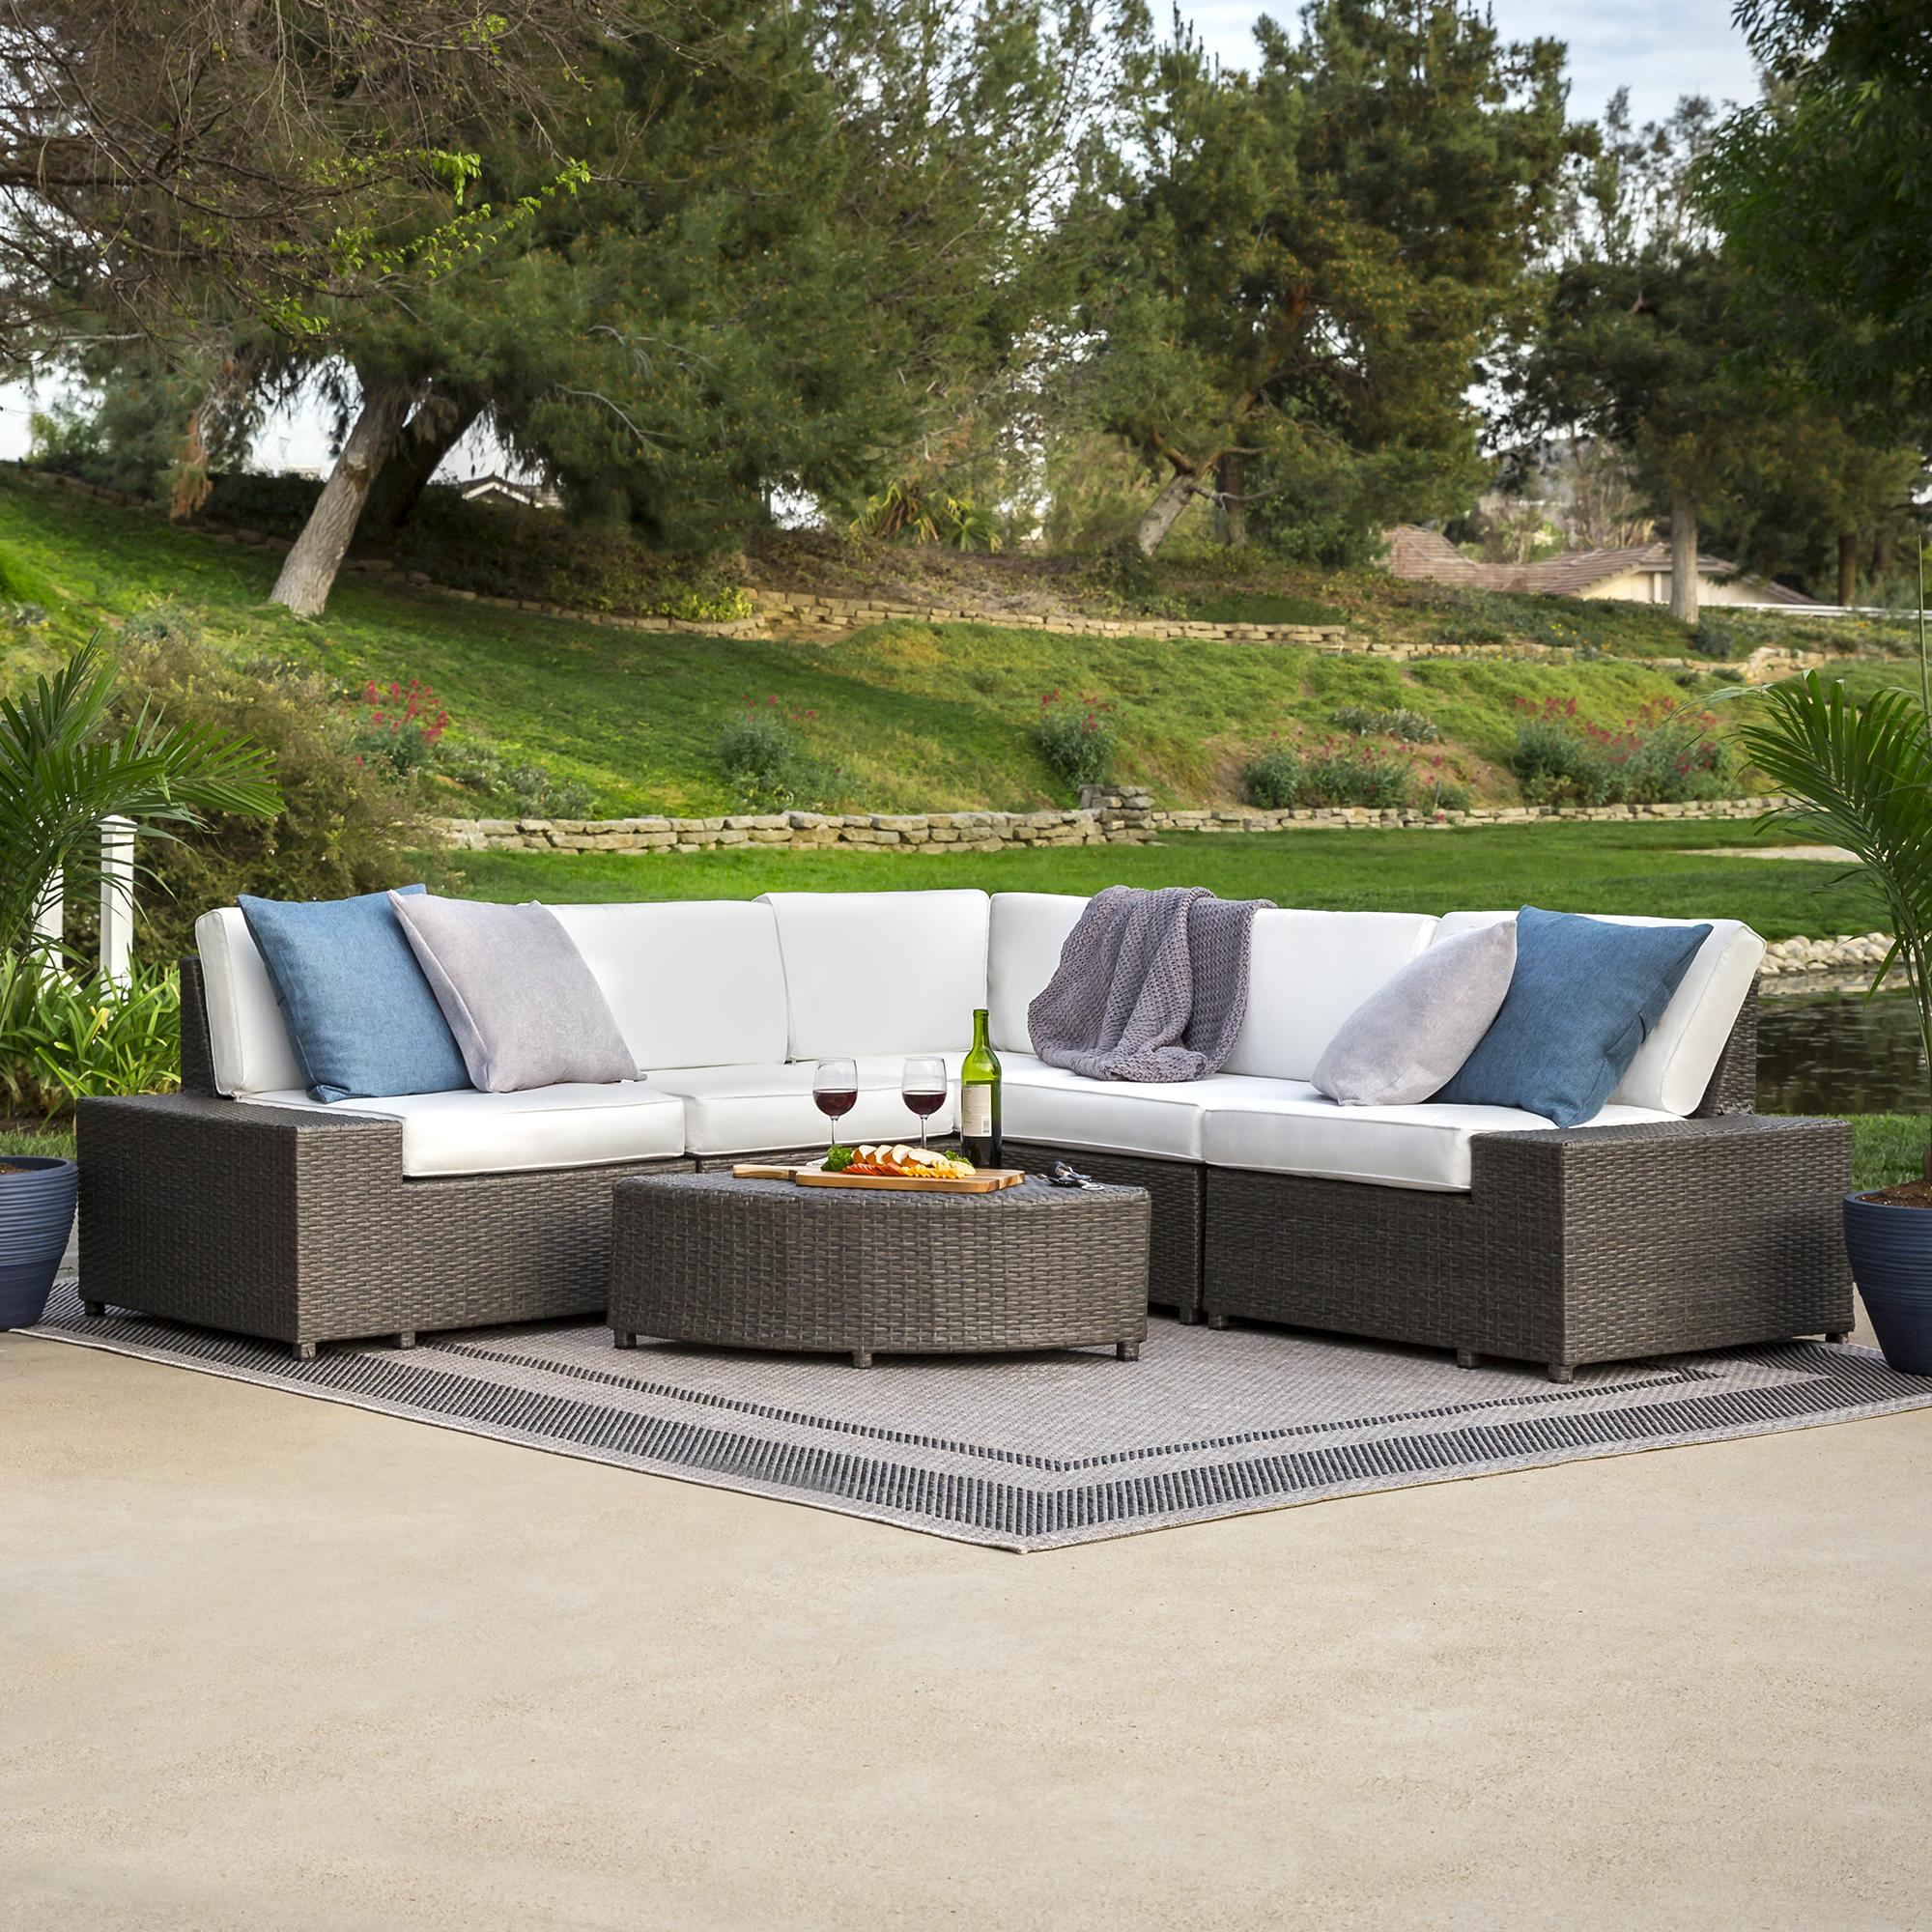 6-Piece Wicker Sectional Sofa - Gray